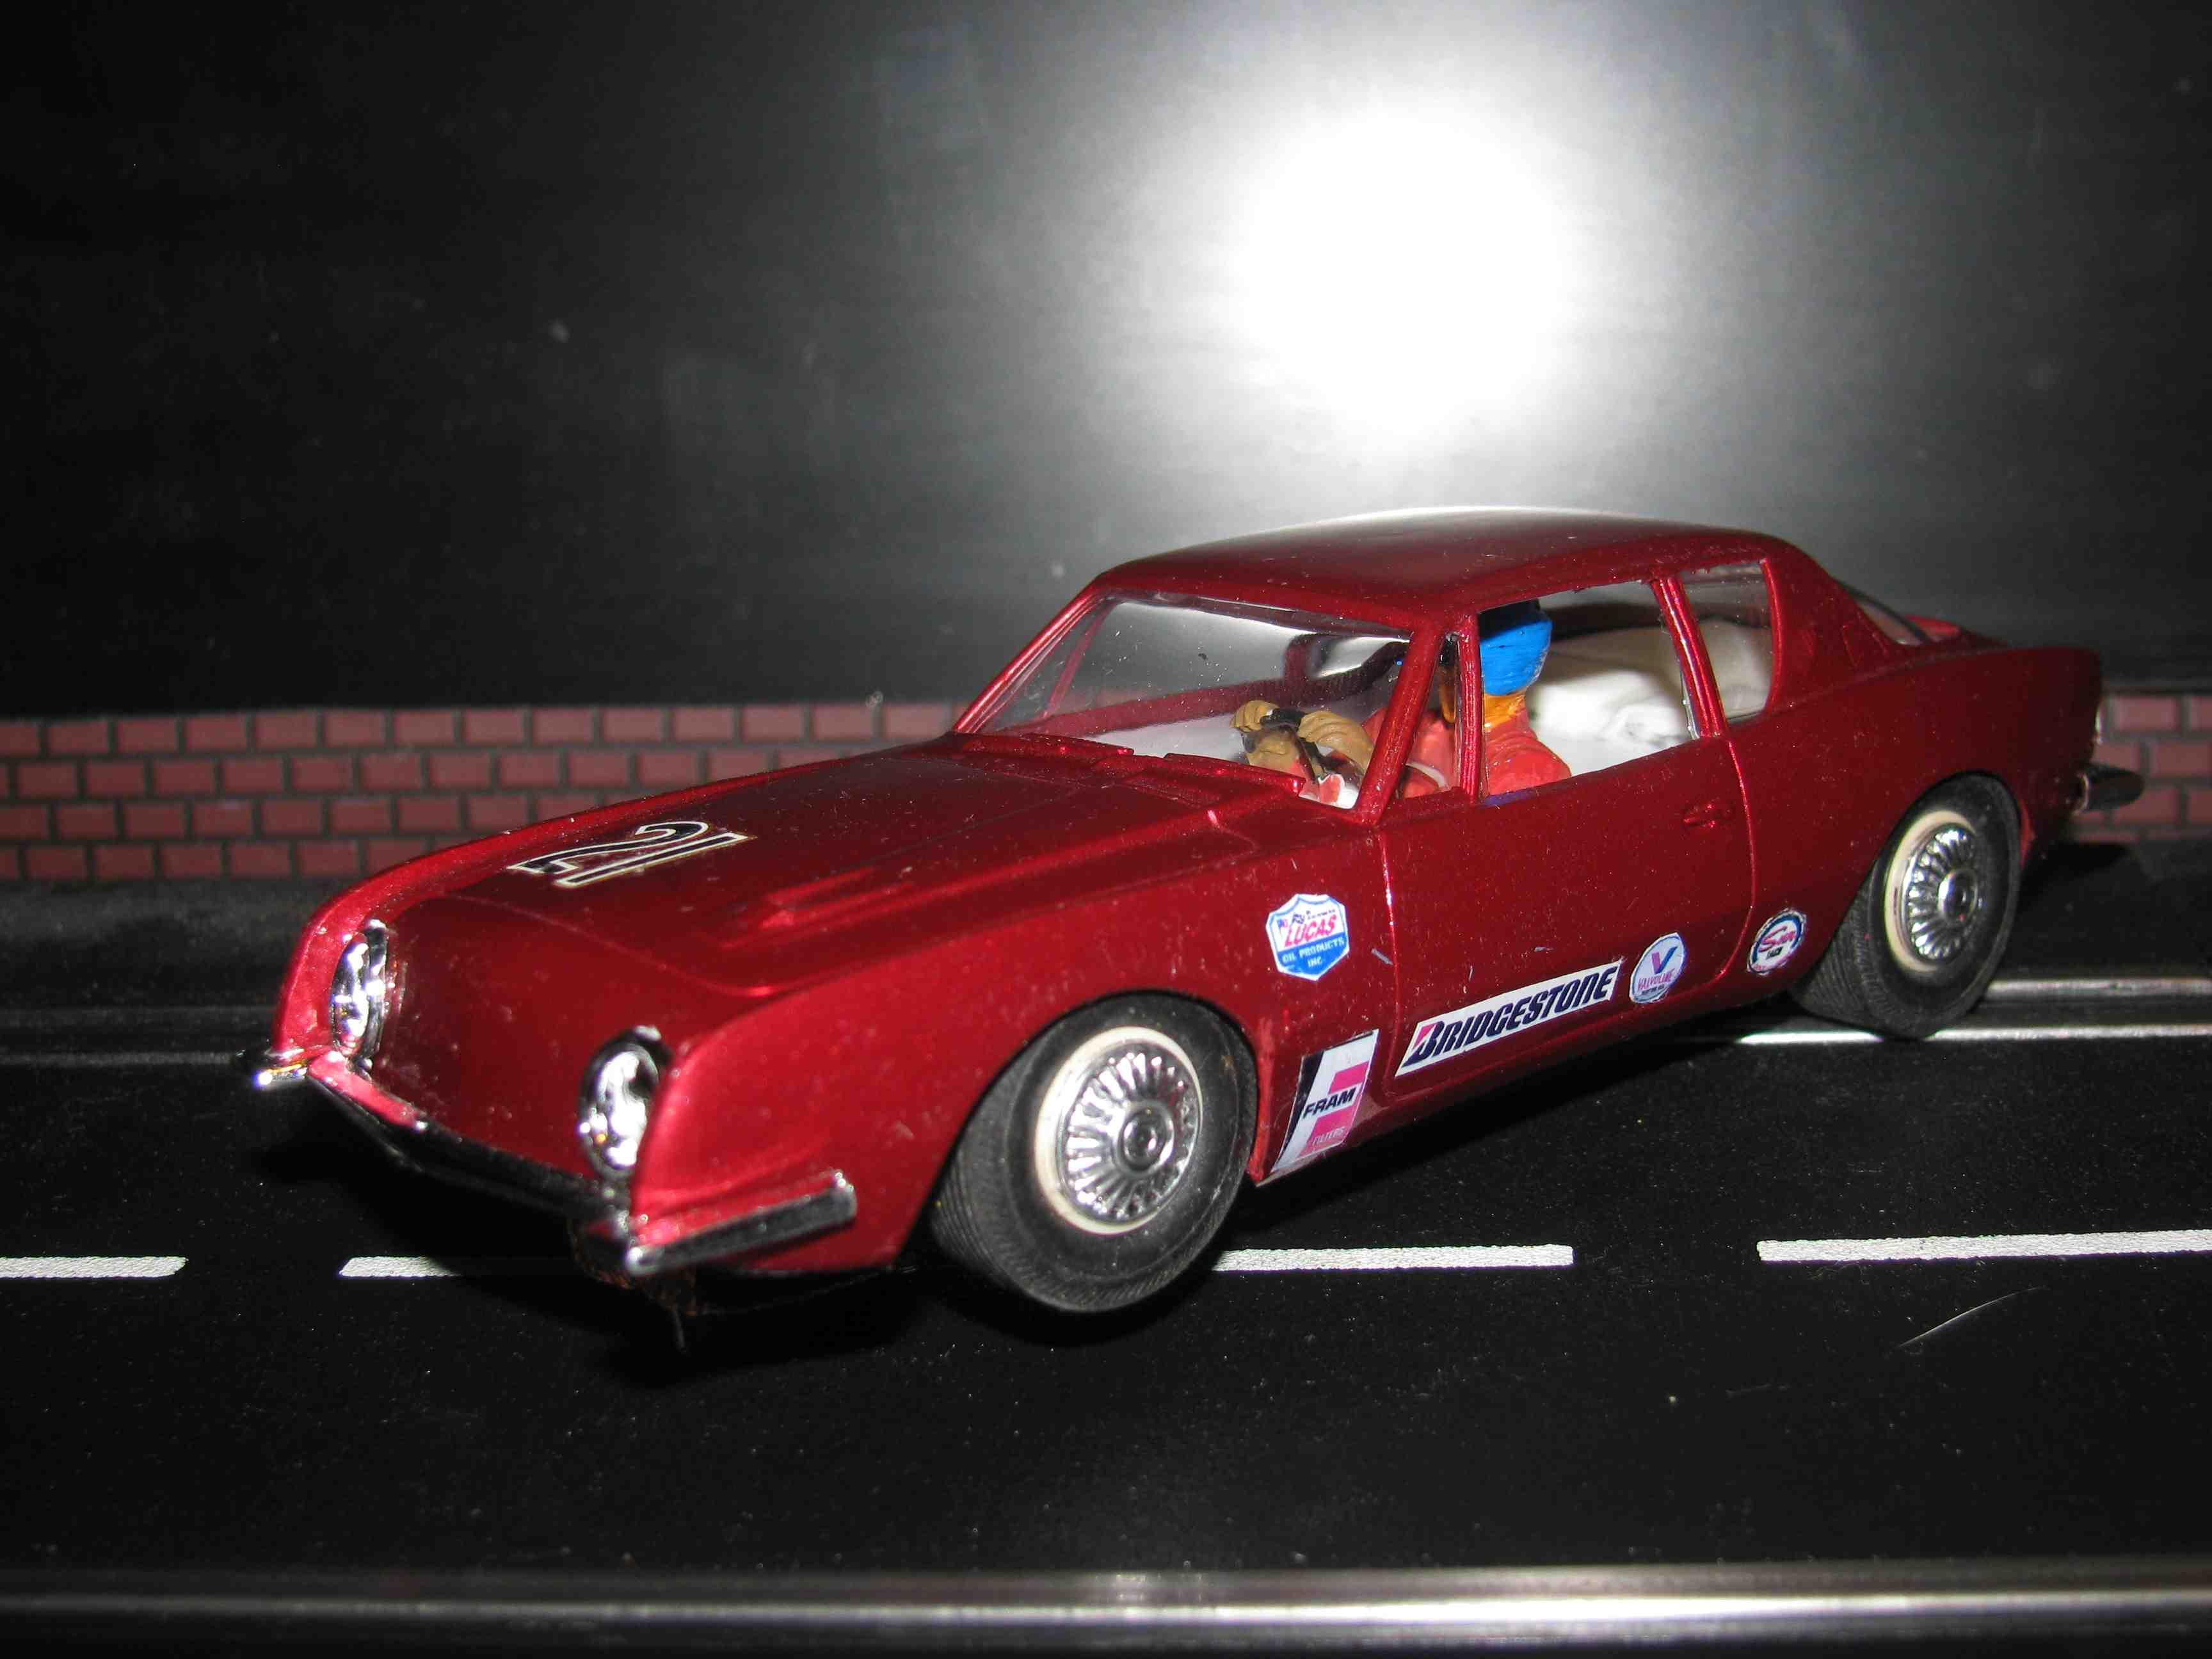 * SOLD * Vintage Revell Studebaker Avanti Slot Car 1/32 Scale – Car 21